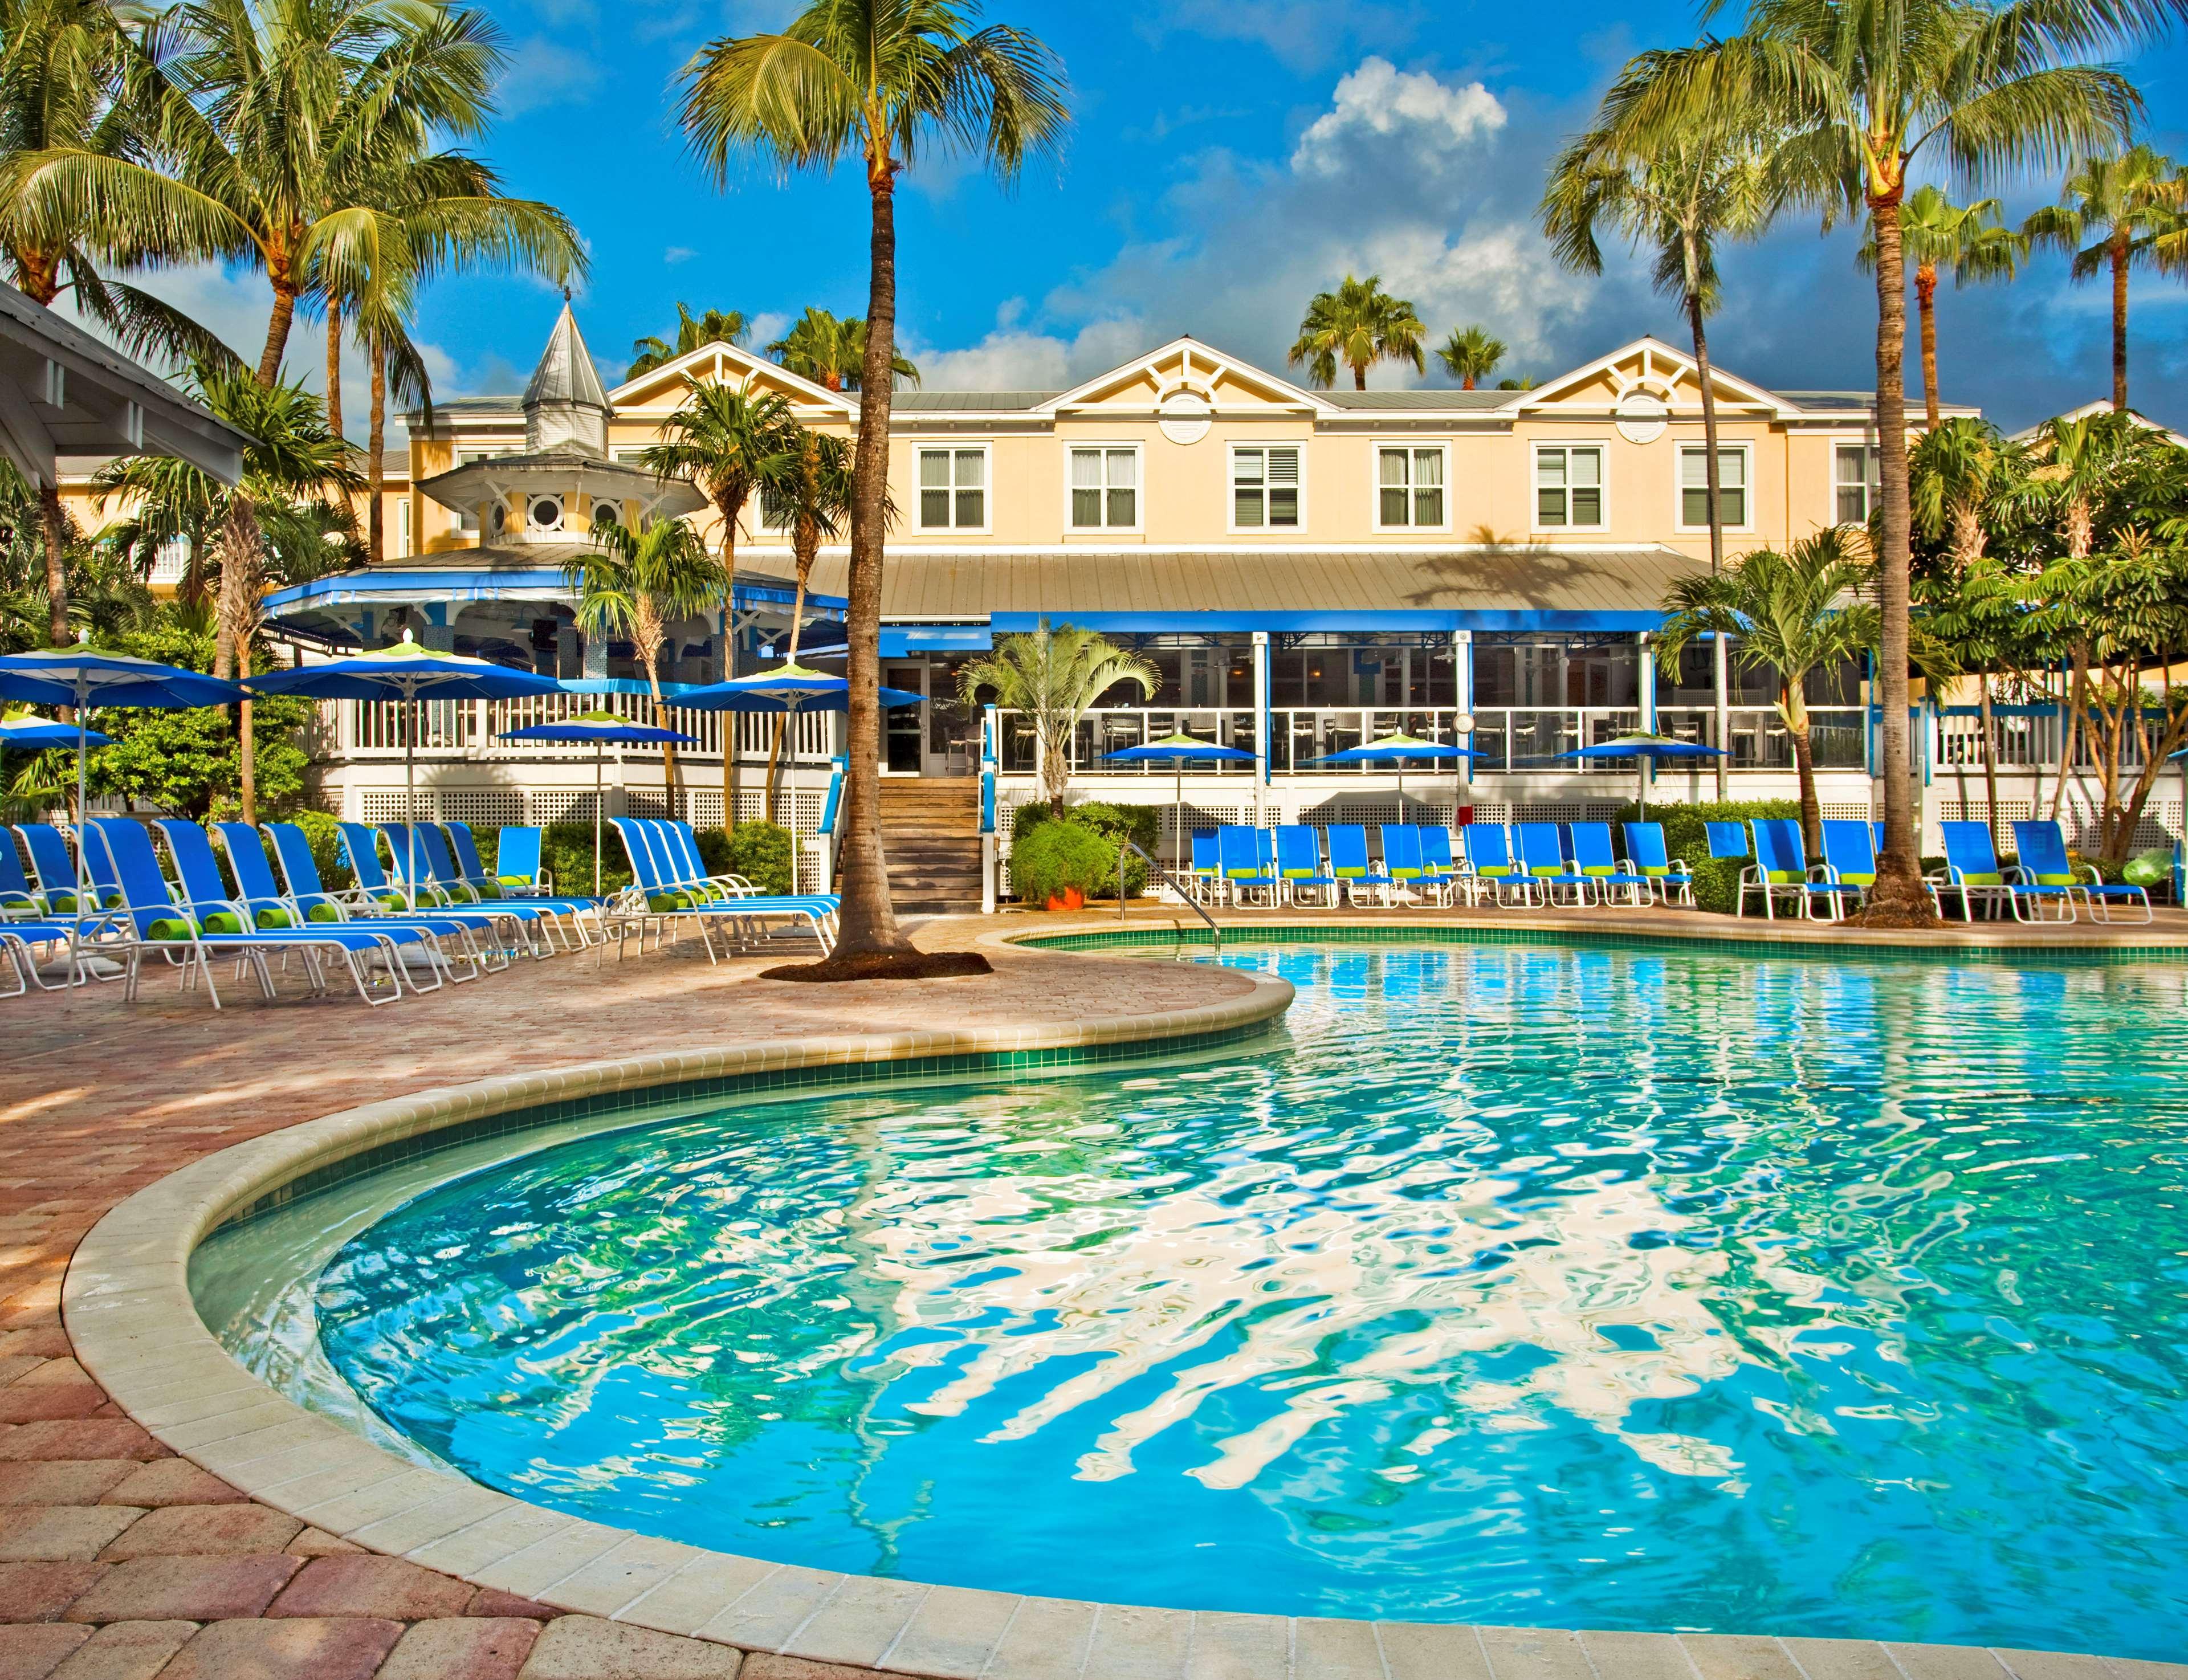 Enterprise Rental Car In Key West Florida